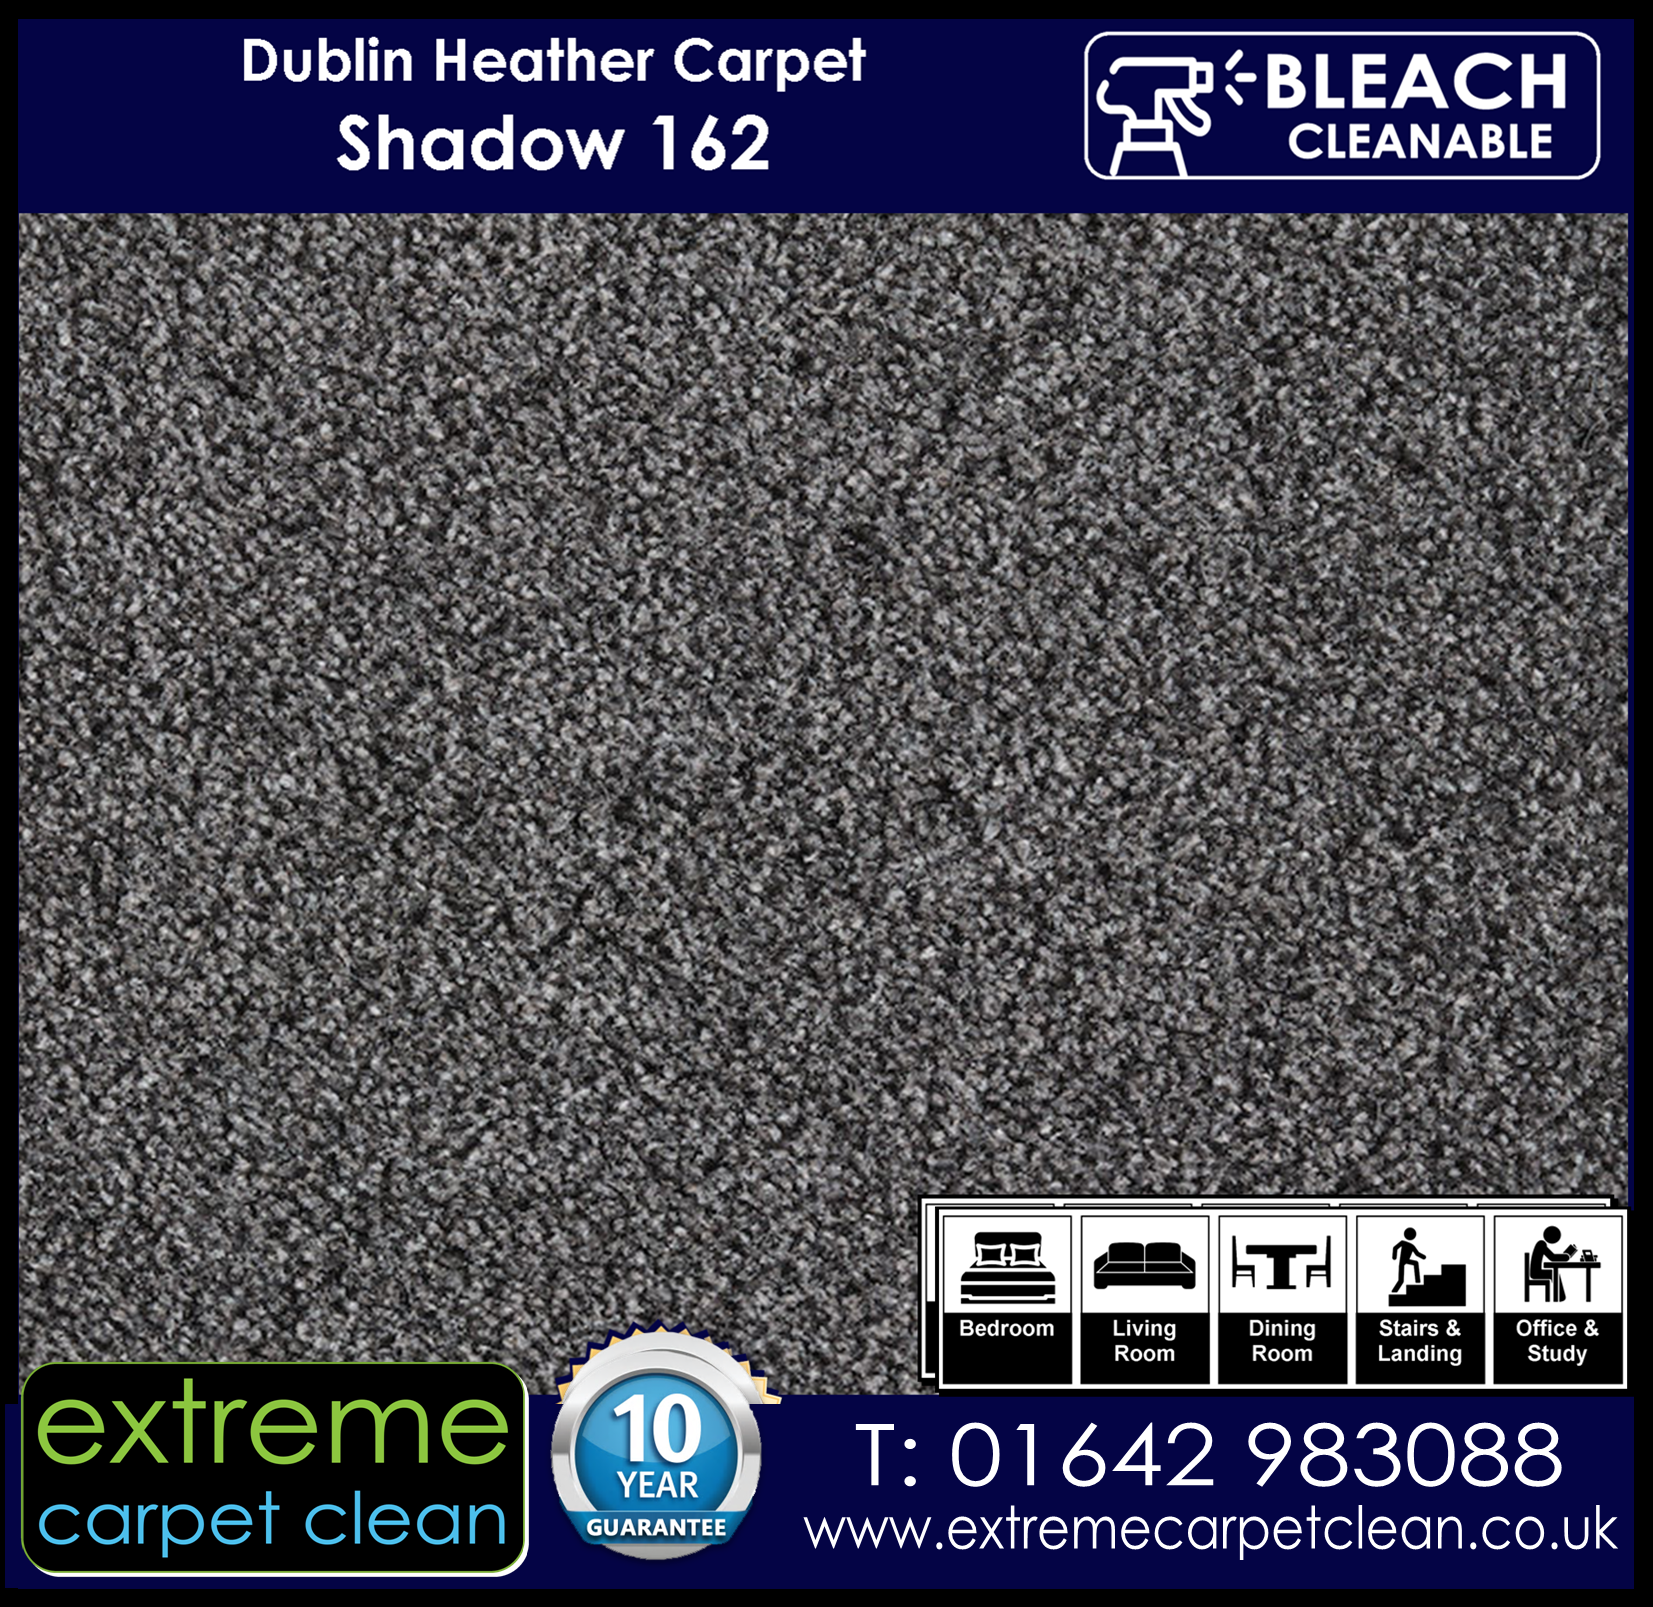 Dublin Heather Carpet Range. Shadow 162 from Extreme Carpet Clean